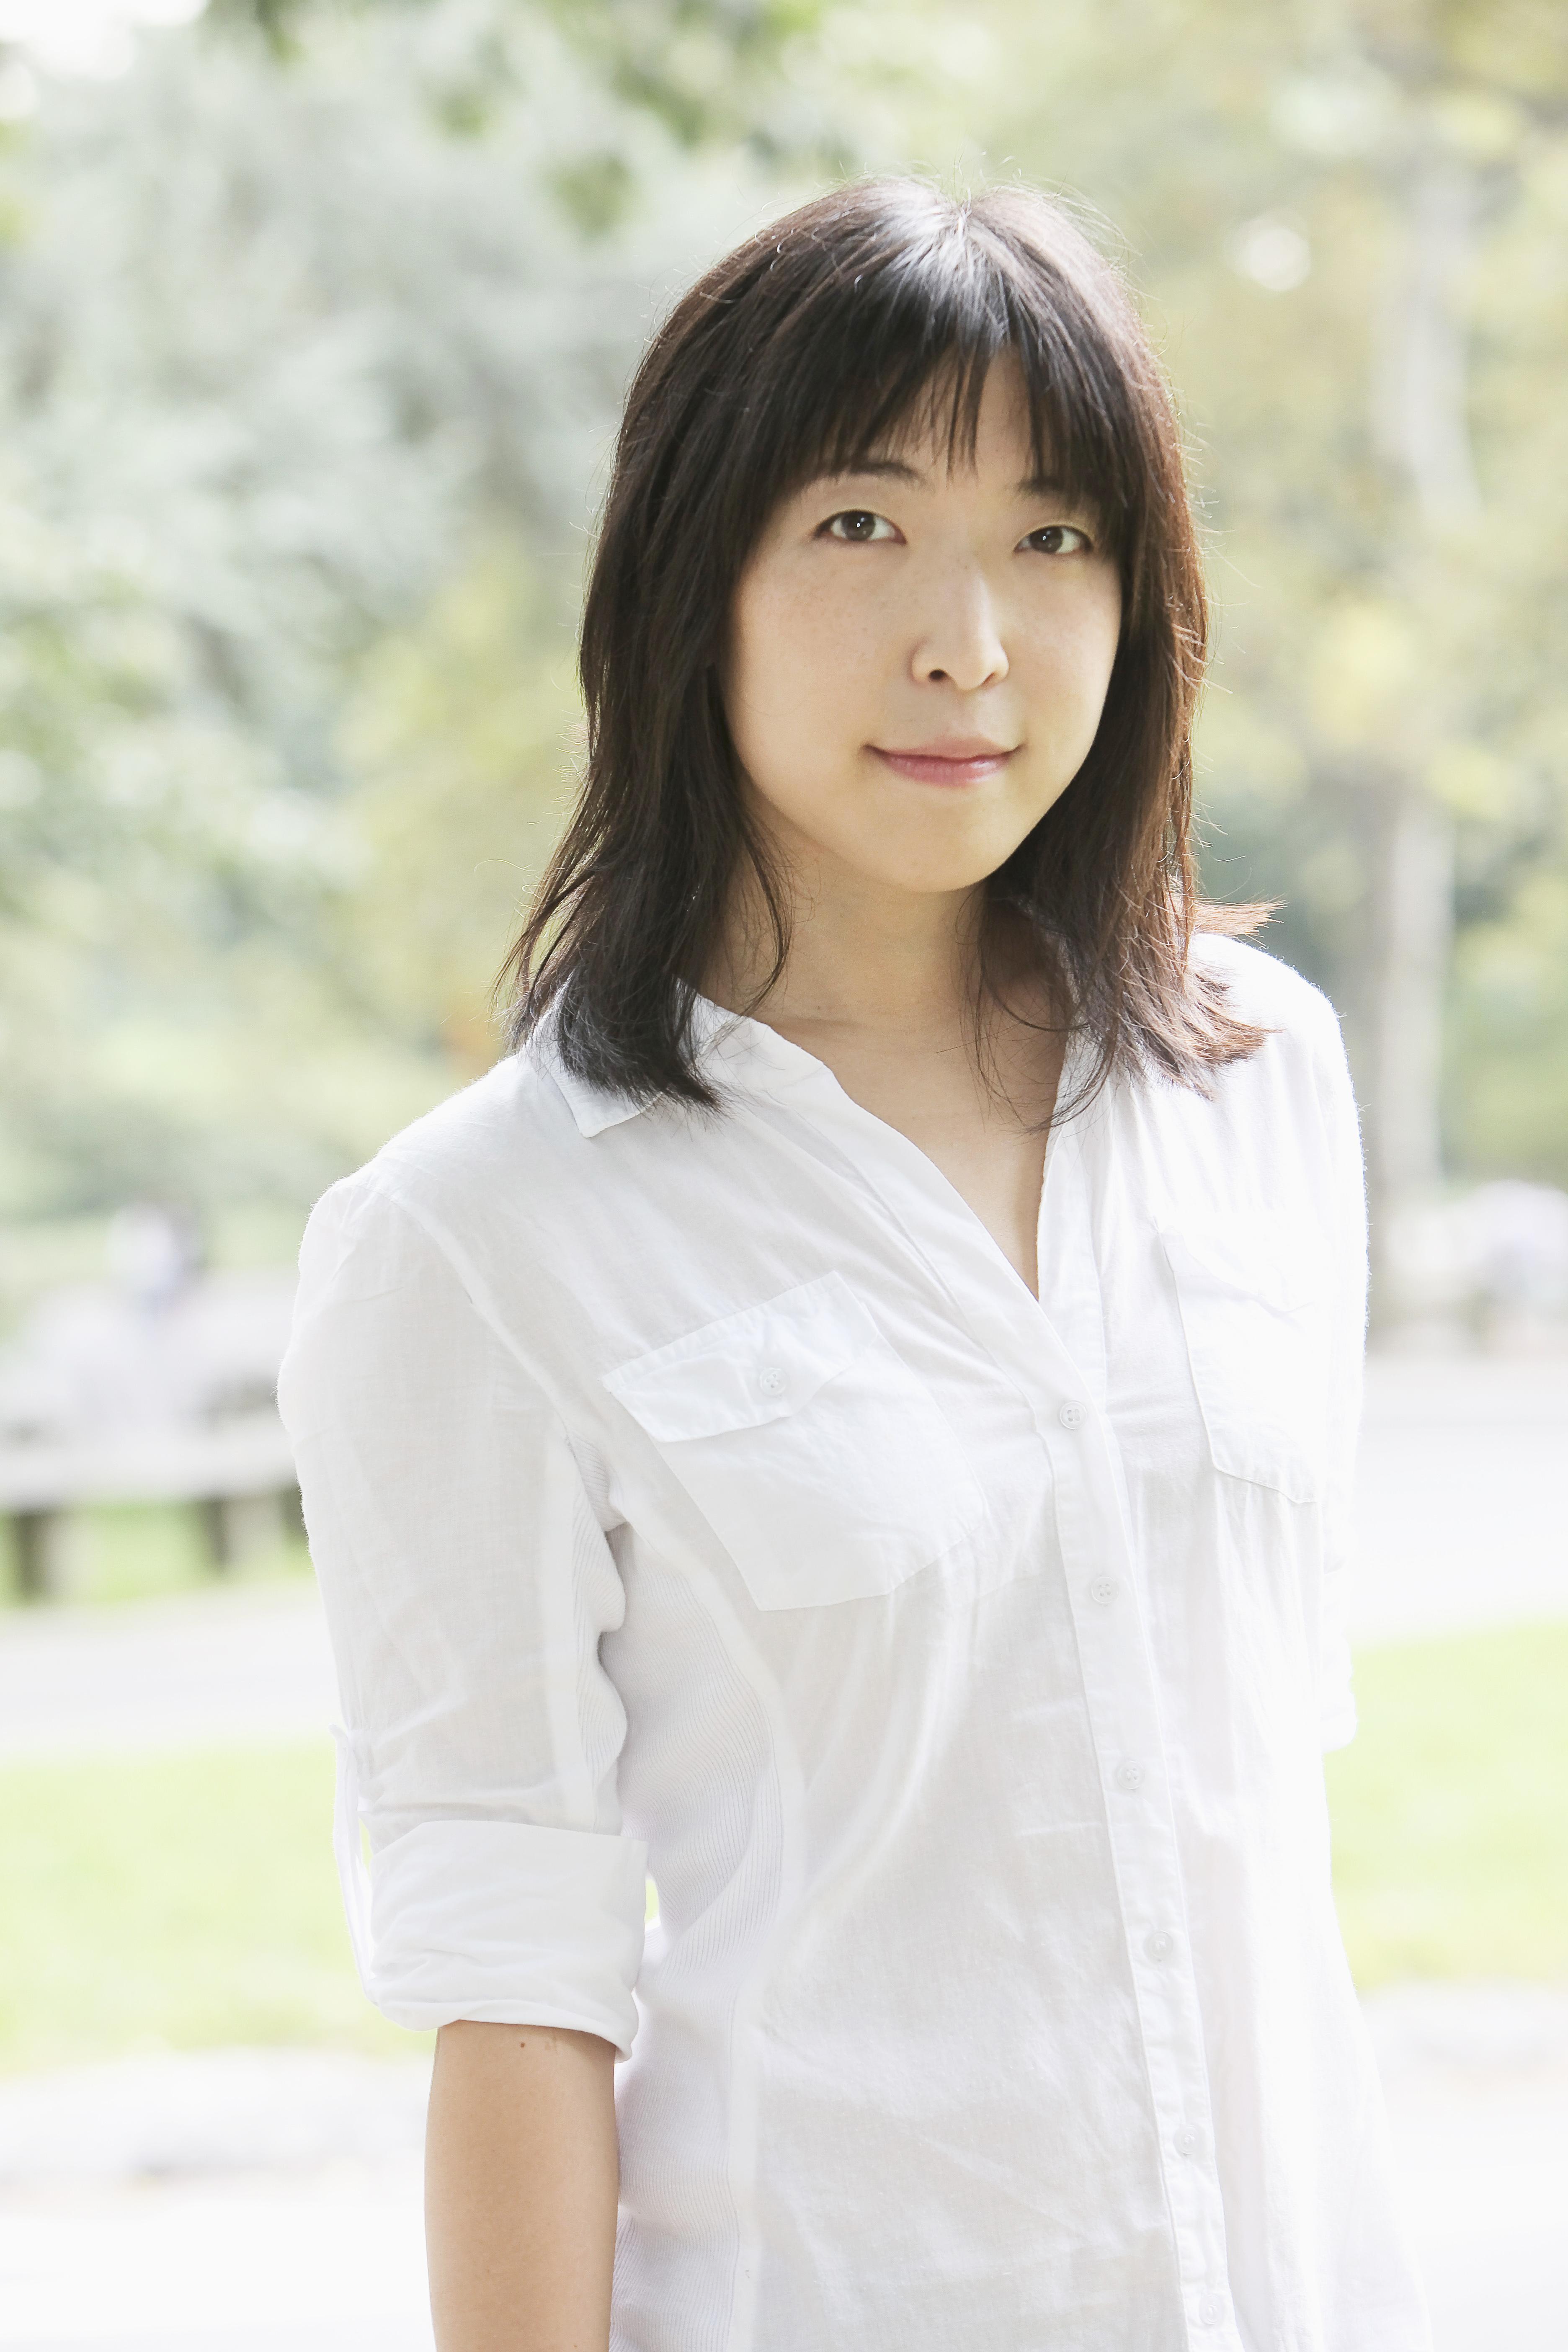 Catherine Chung